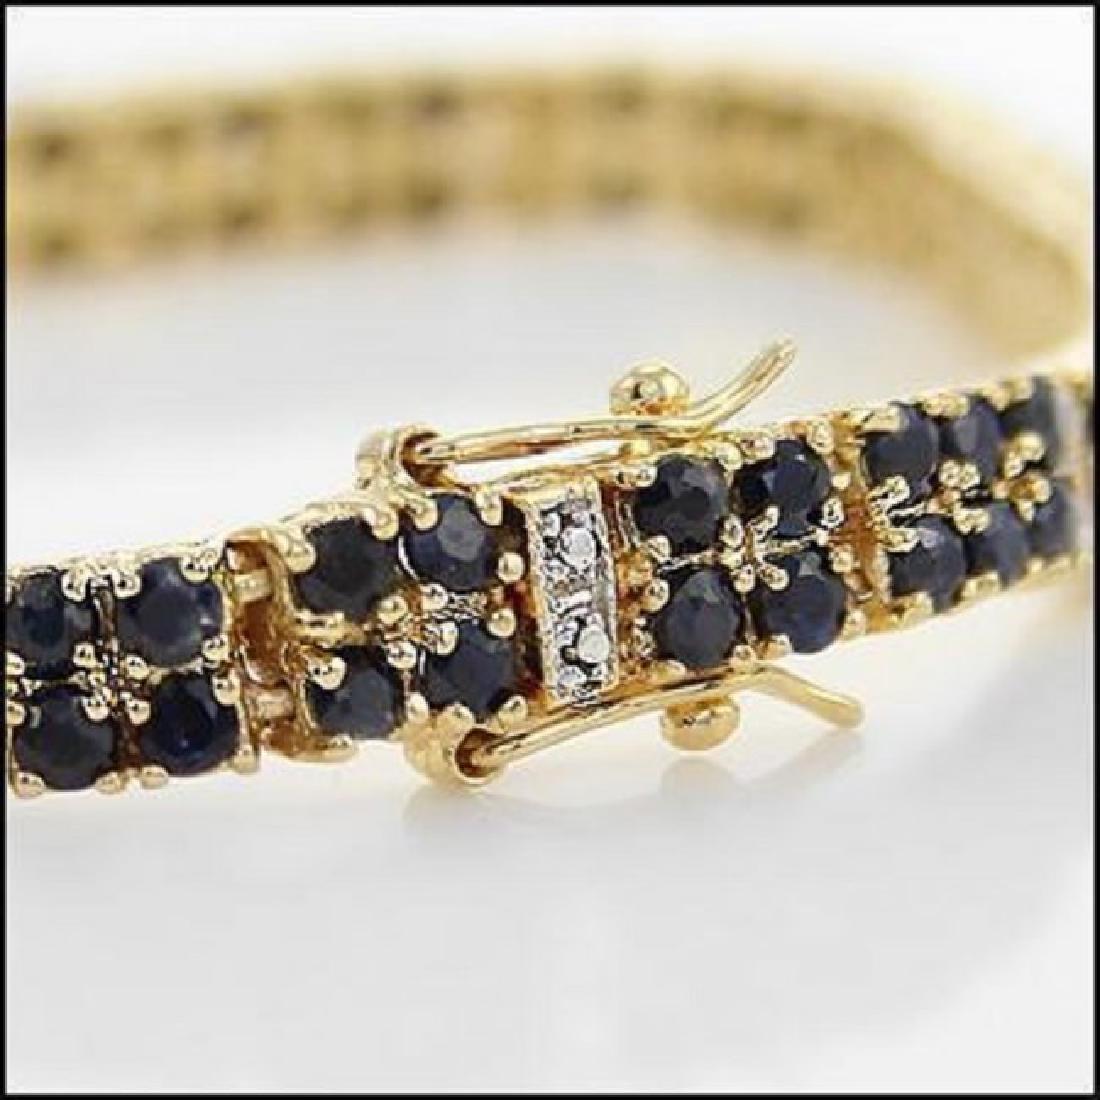 Jewelry Sale 17.69 CT Sapphire & Diamond Bracelet - 4